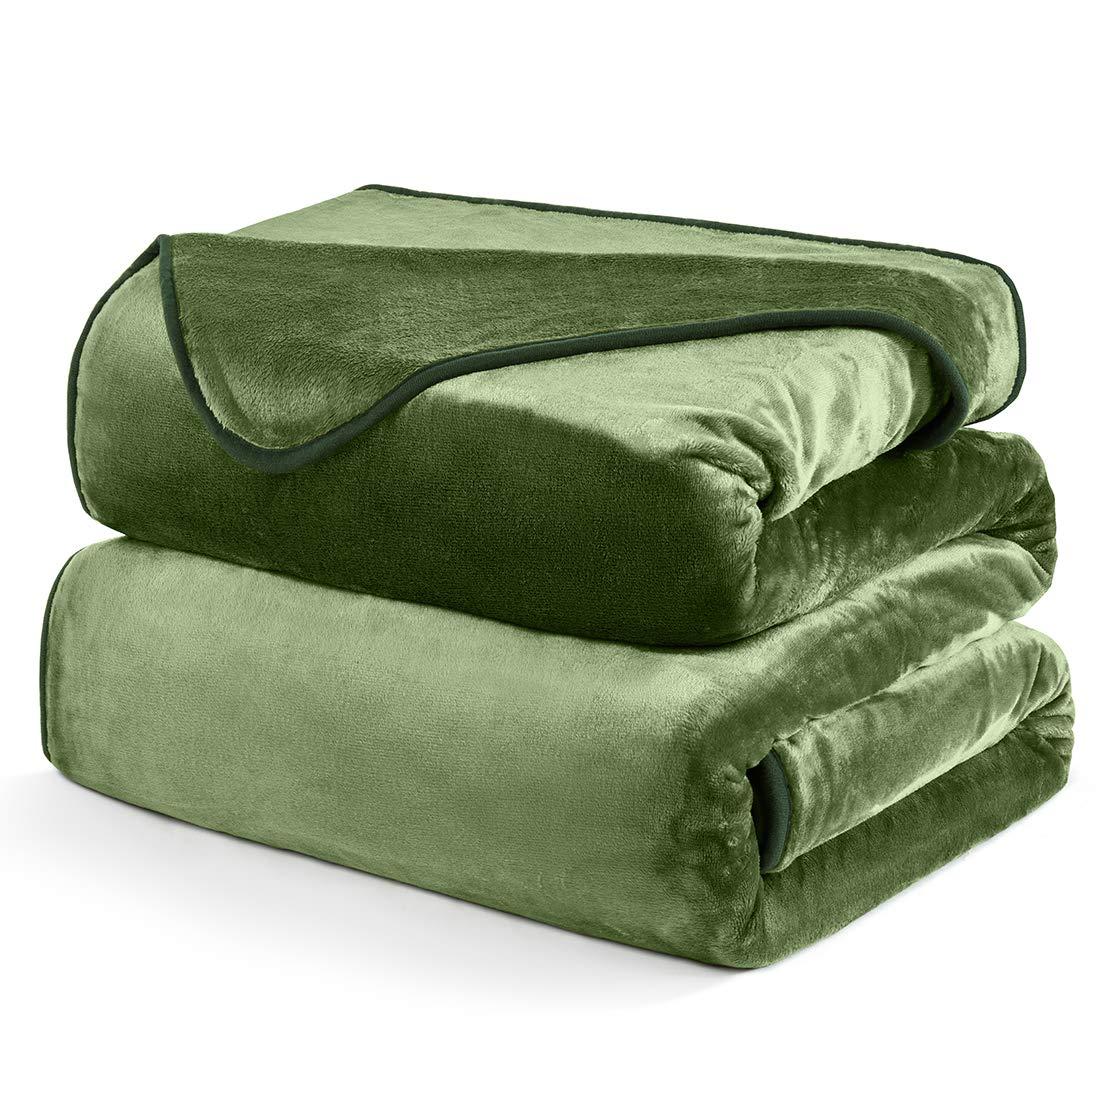 DREAMFLYLIFE Fleece Blanket Queen, Warm Soft Blanket Queen Size Luxury Velour Blankets for Bed Ivory Queen-Size, 90x90 in